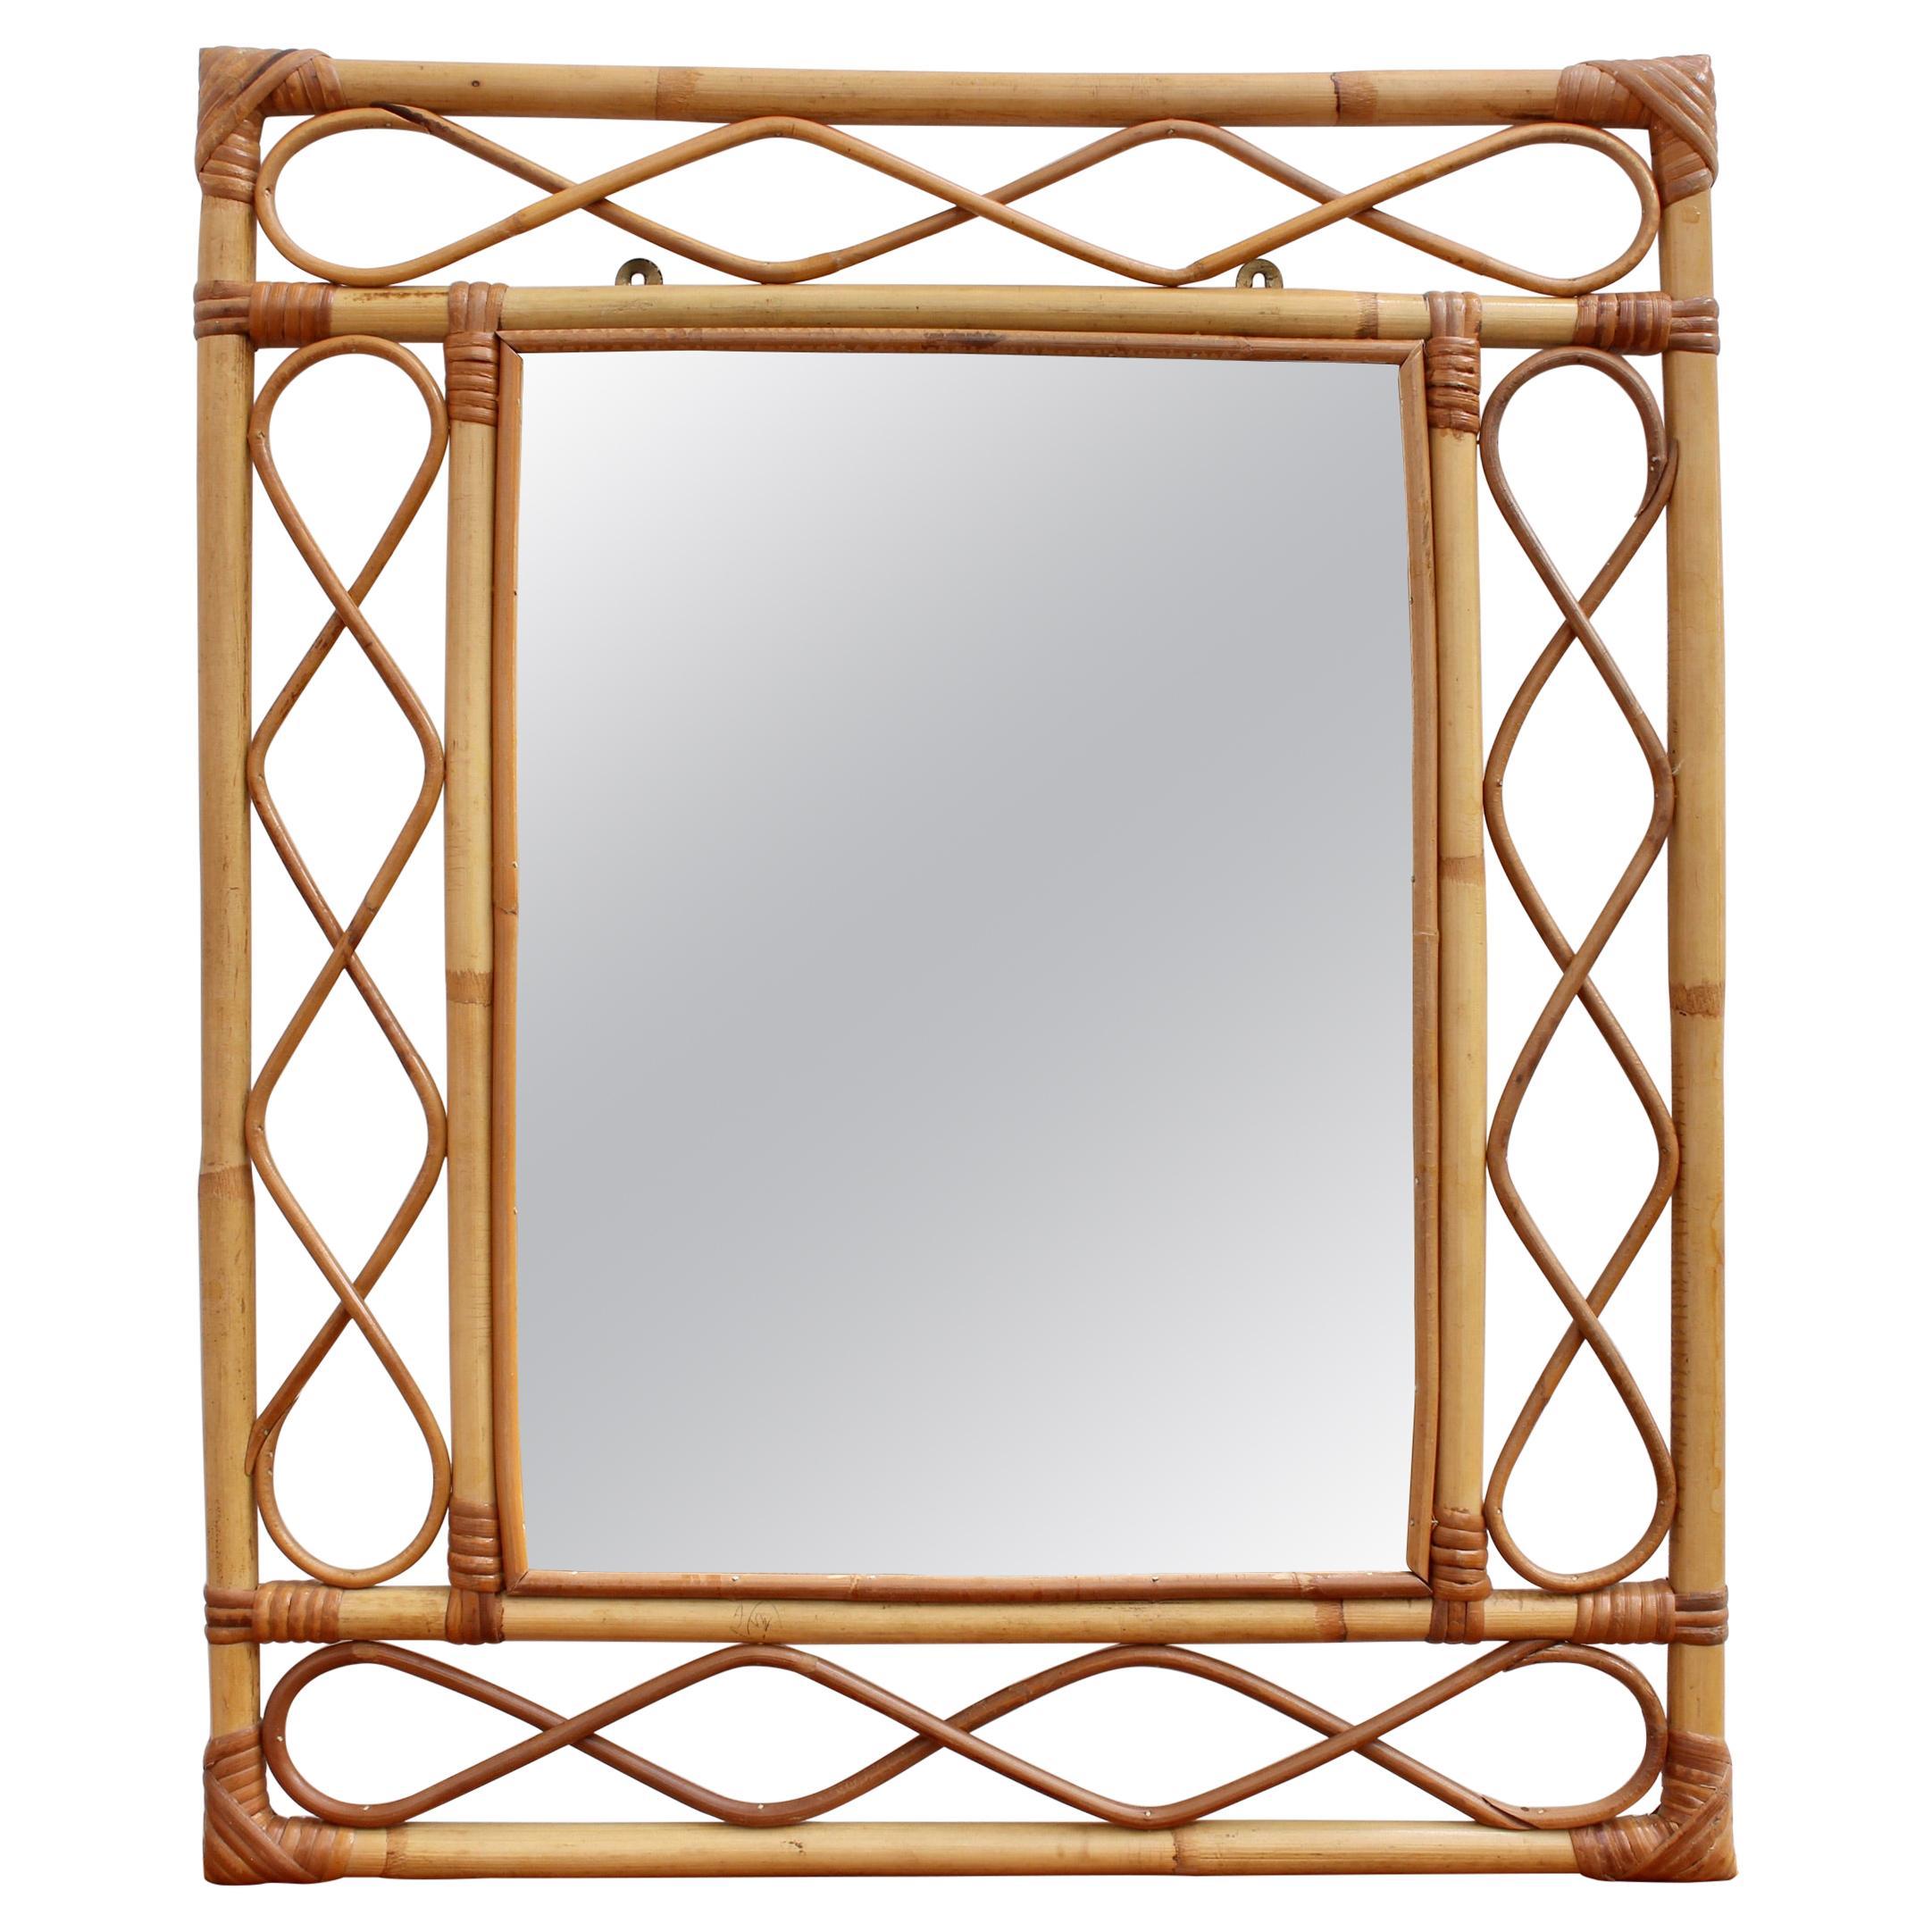 Rectangular French Rattan Wall Mirror 'circa 1960s'